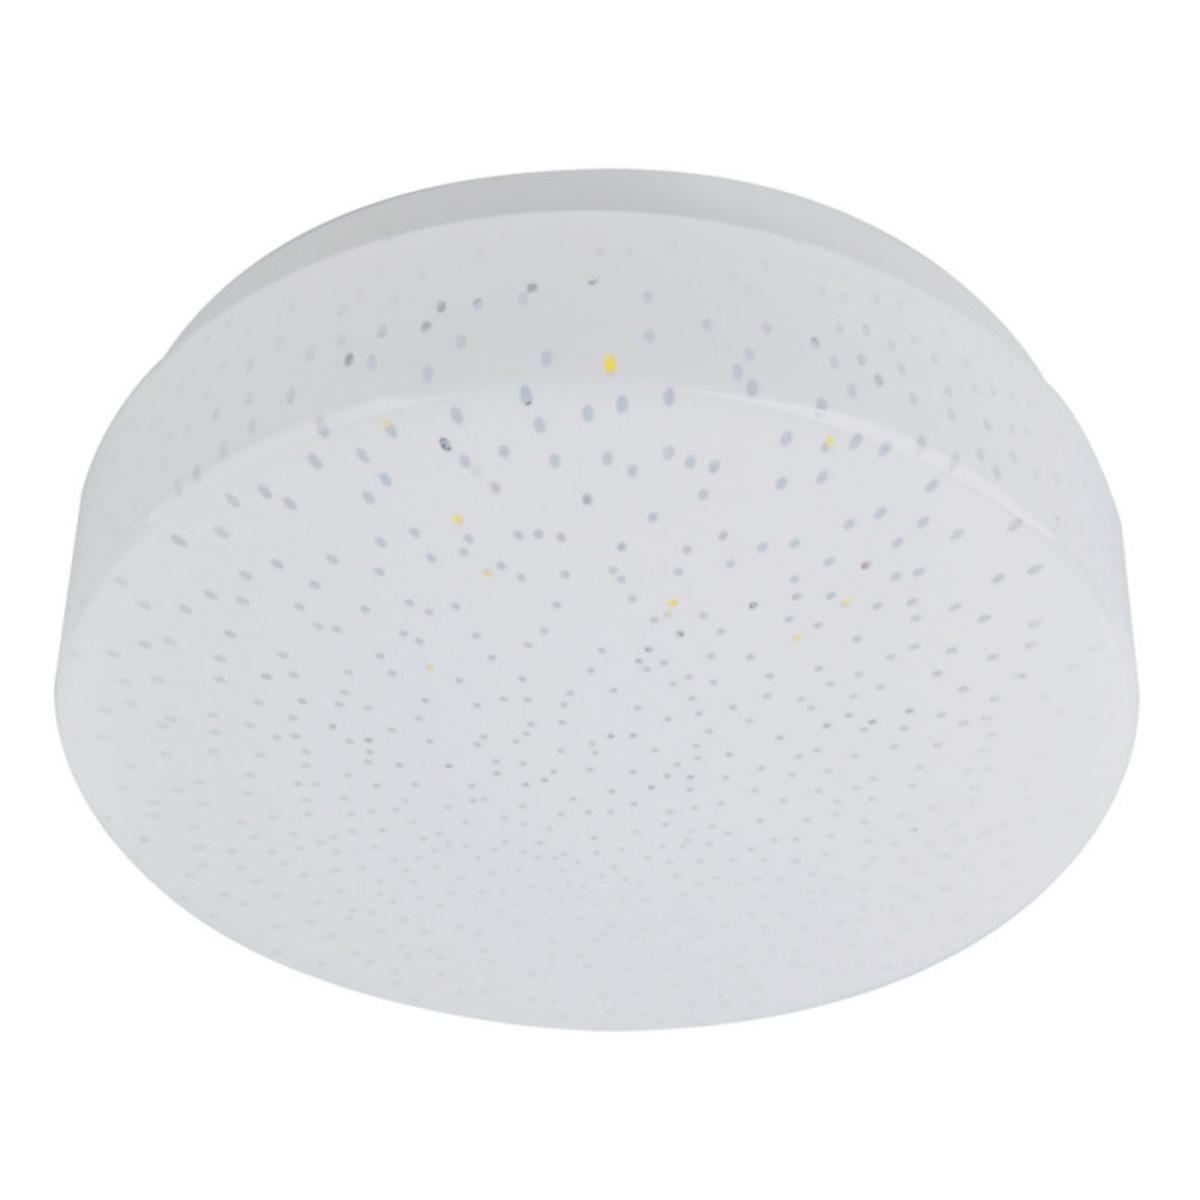 Купить Накладной светильник GAMBA Накладной светильник ARTE Lamp A3206PL-1WH (14711), HomeMe